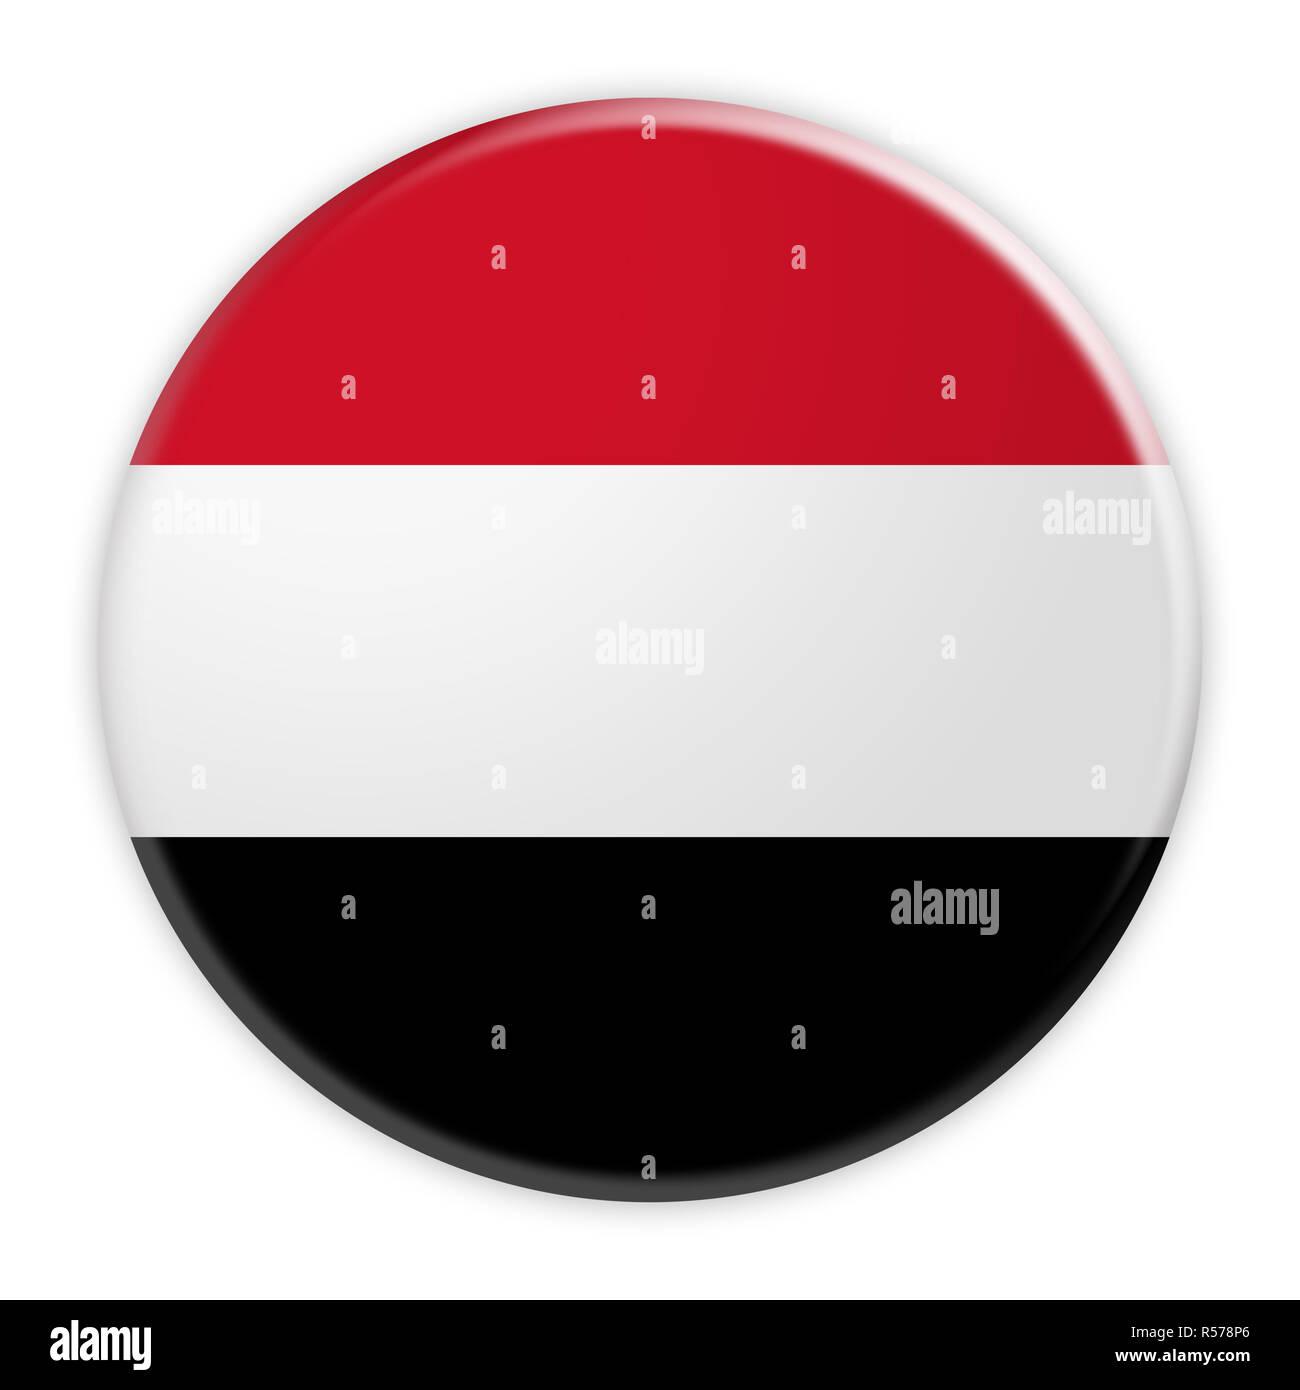 Yemen Flag Button, News Concept Badge, 3d illustration on white background Stock Photo